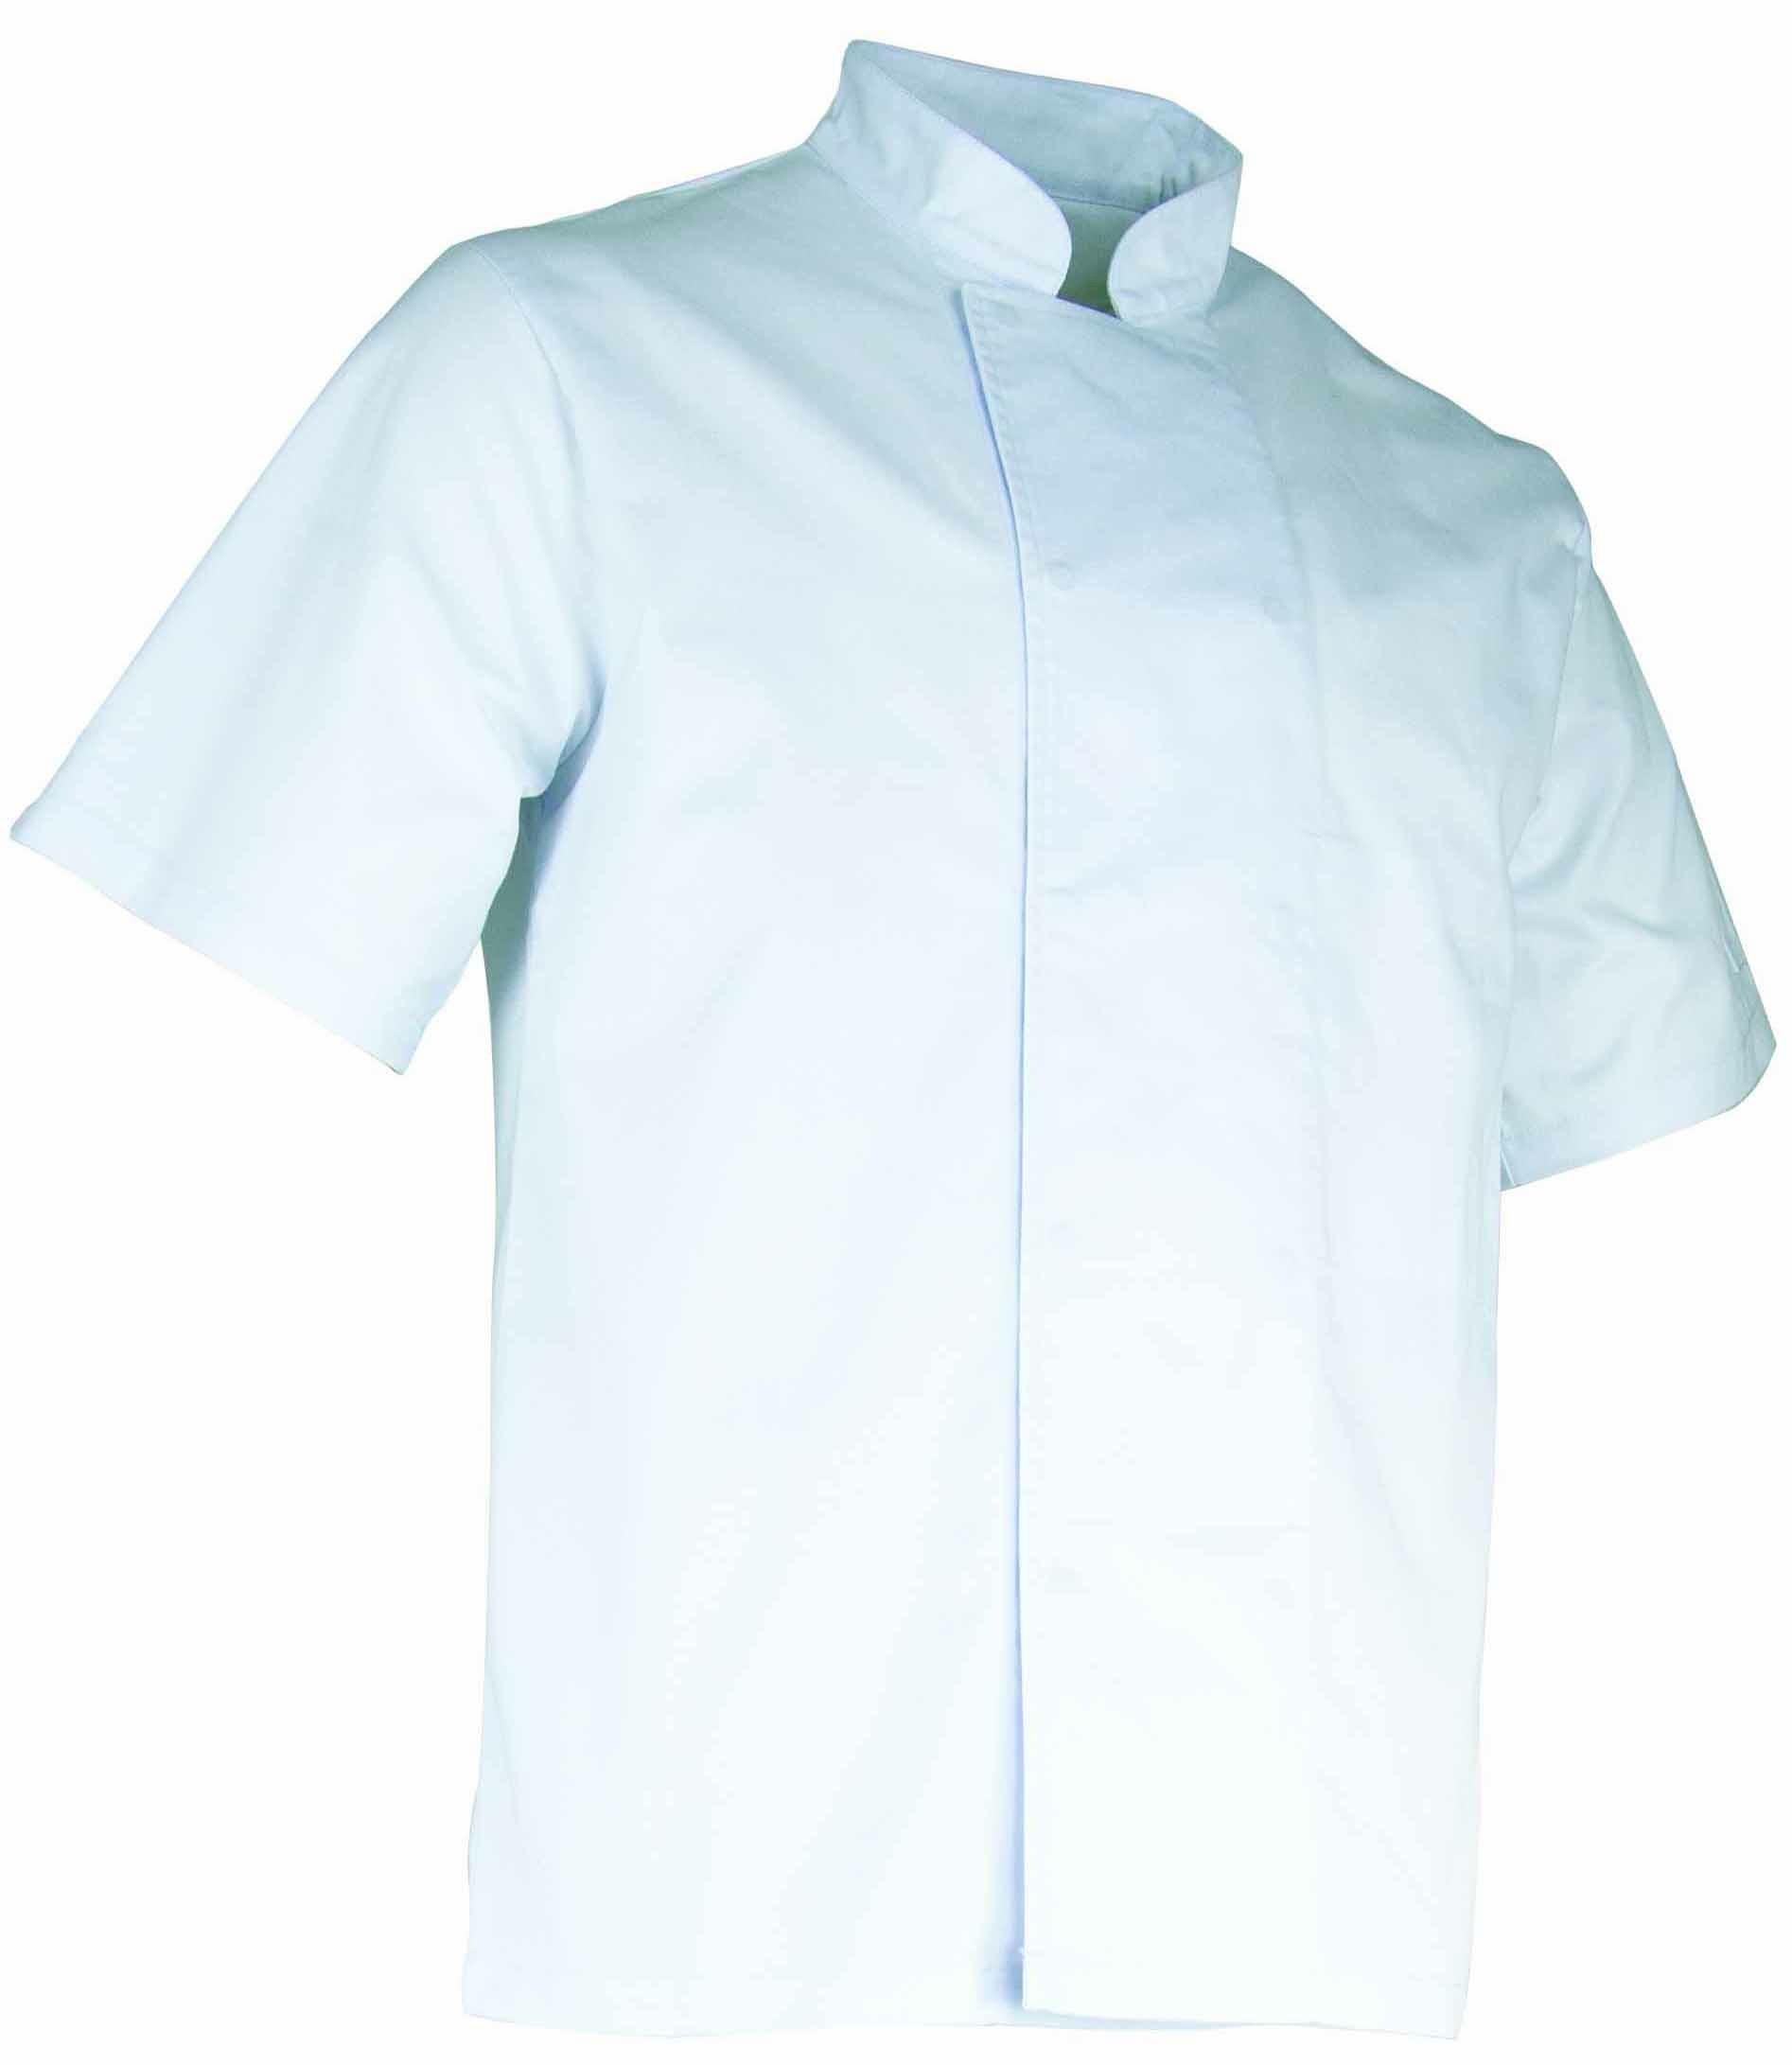 Veste cuisinier blanche...